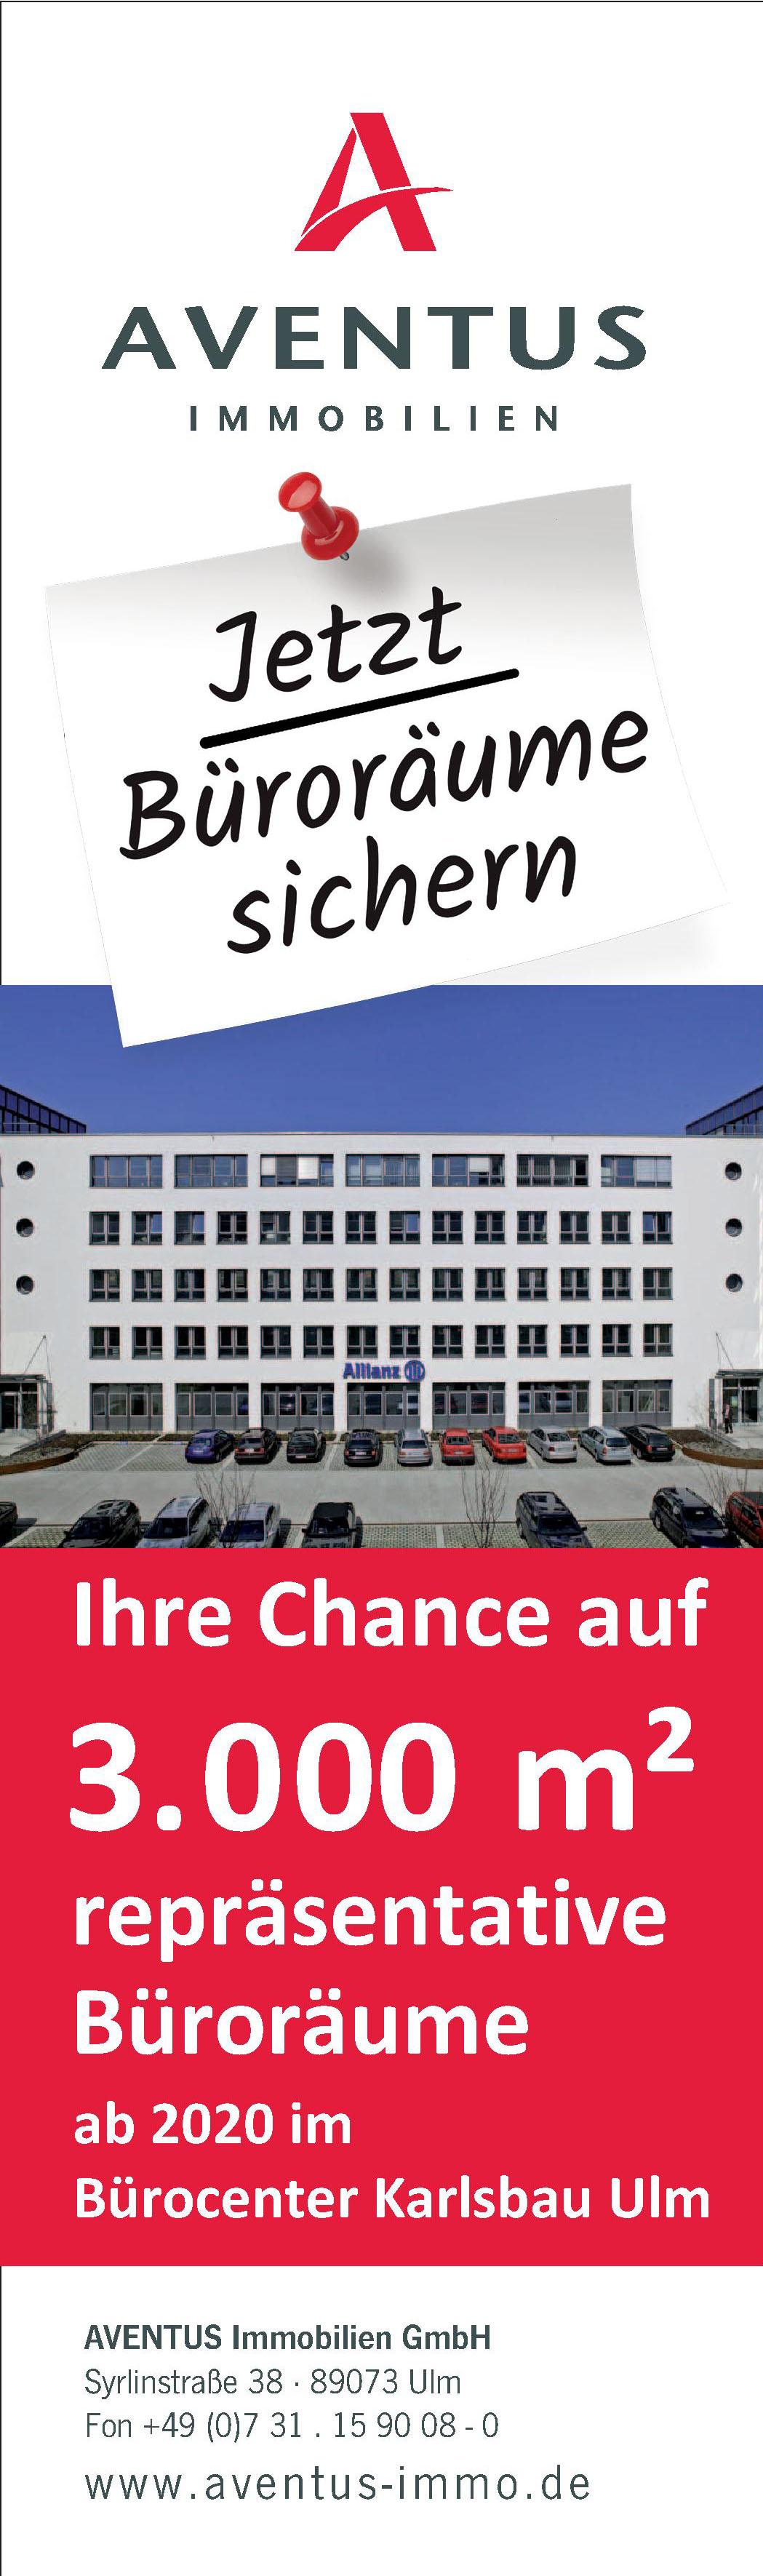 Aventus Immobilien GmbH